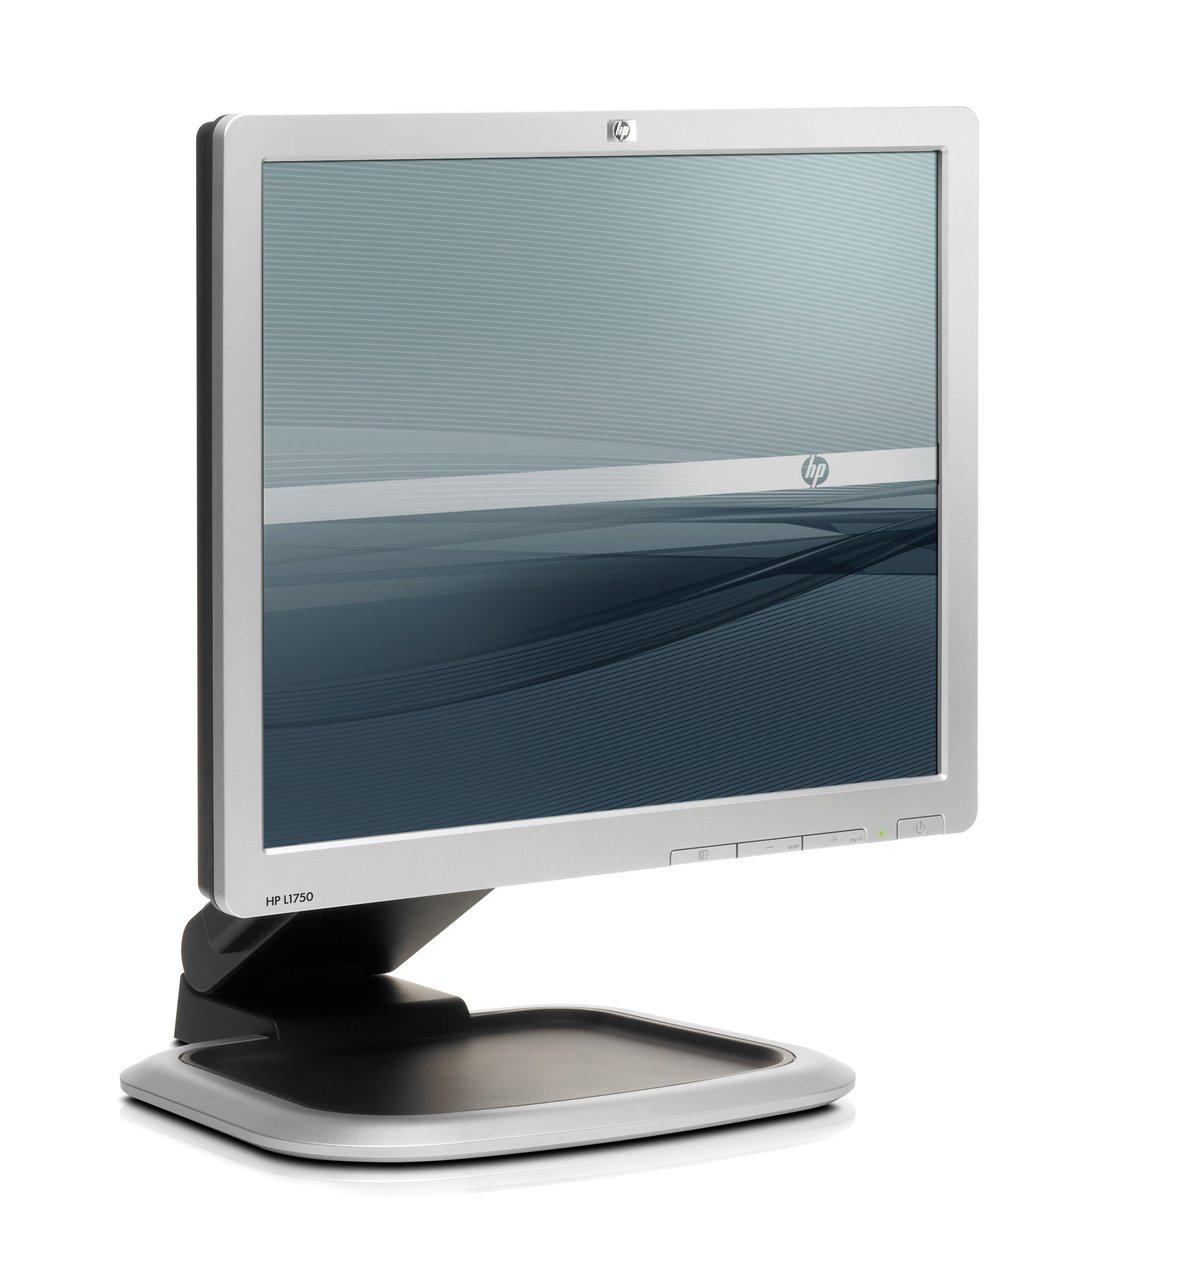 HP L1750 17 LCD Monitor - 1280x1024 SXGA, 800:1 Contrast Ratio, 5ms, DVI,  VGA, USB Hub, Tilt, Height Adjustable at TigerDirect.com